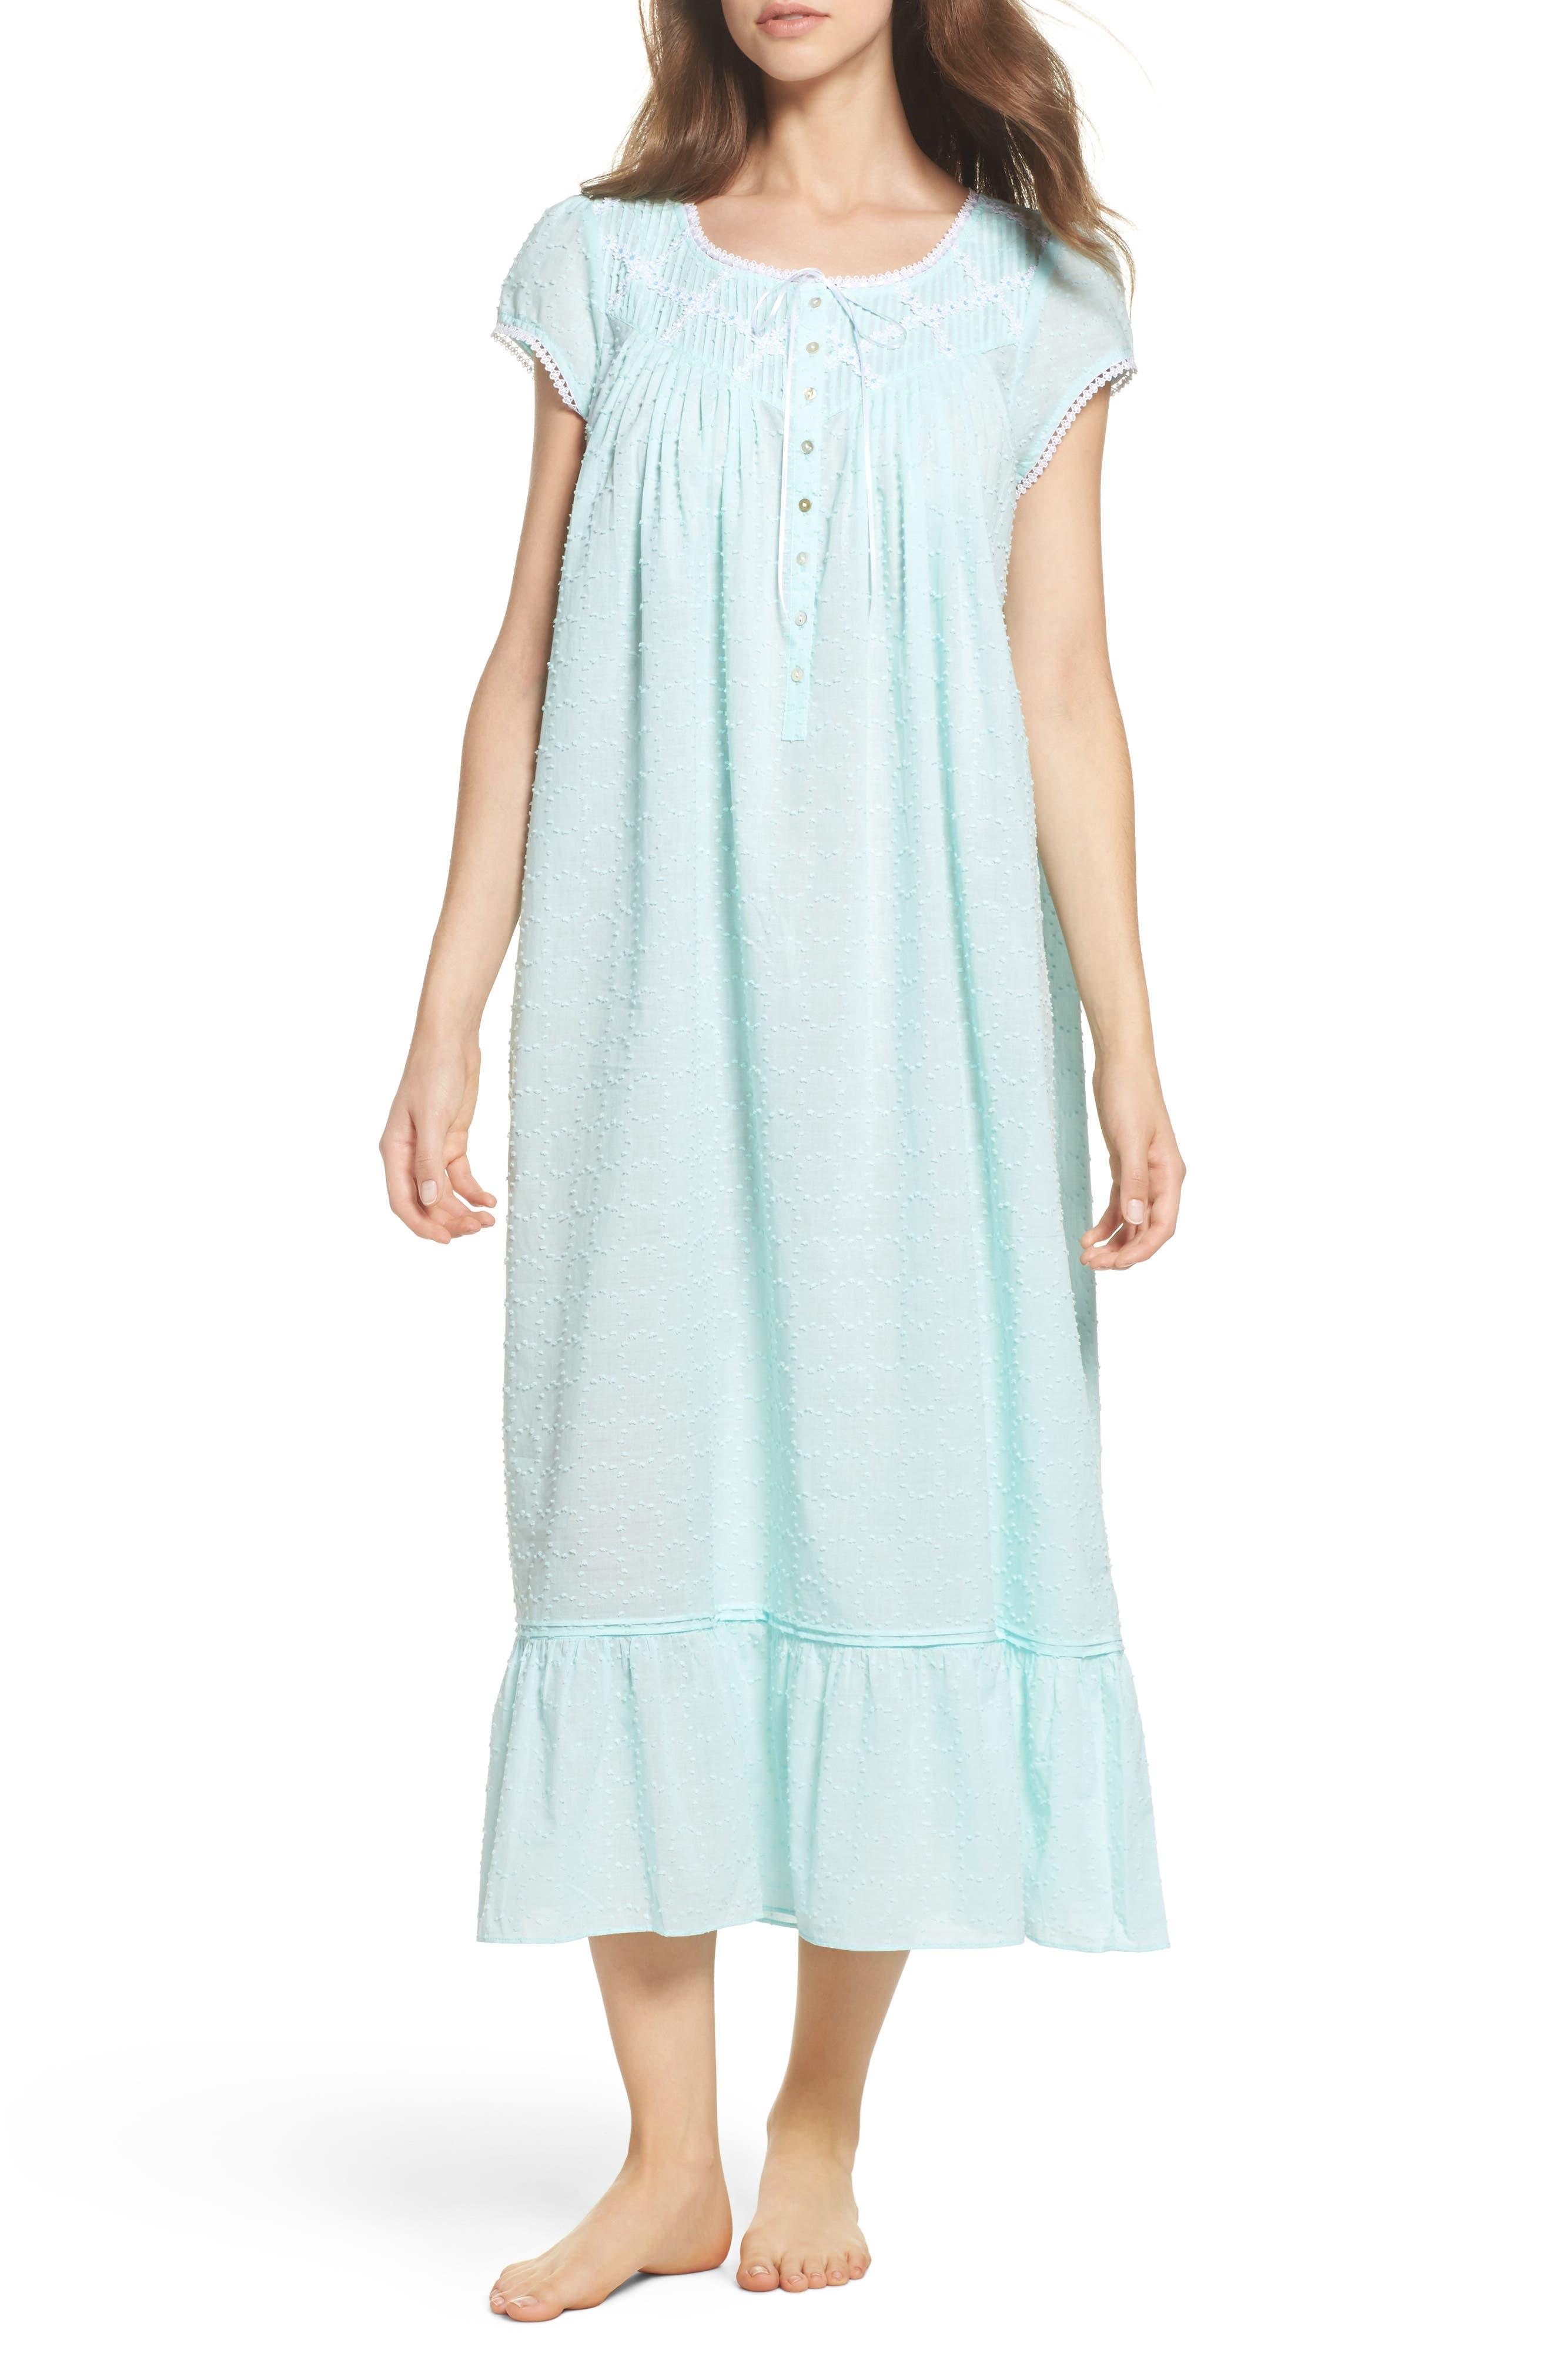 Cotton Ballet Nightgown,                             Main thumbnail 1, color,                             400